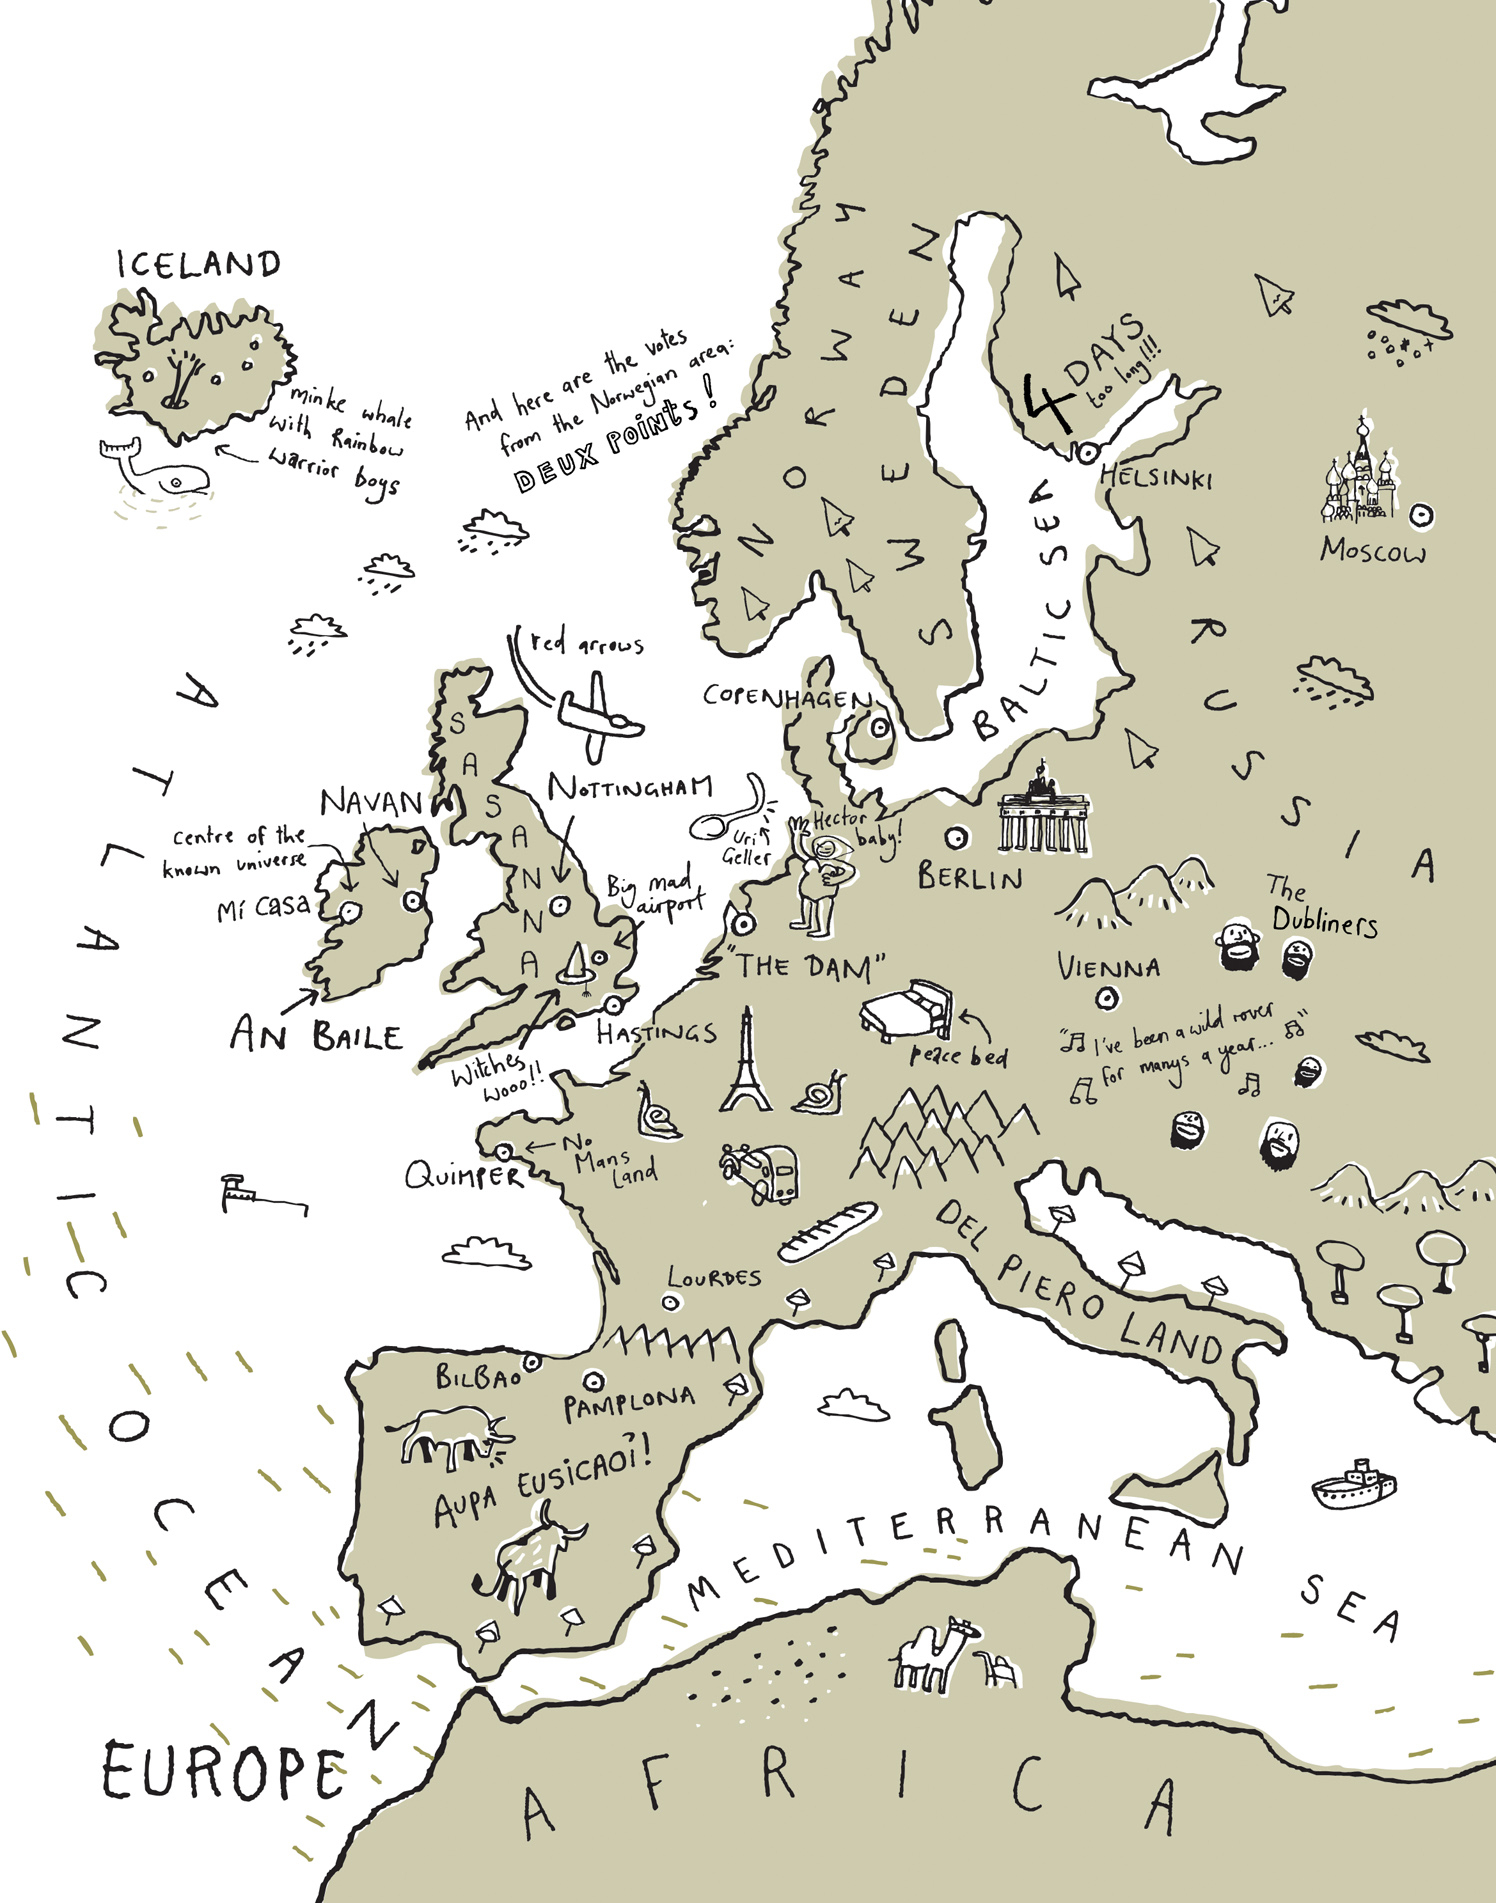 Visiting Europe Map